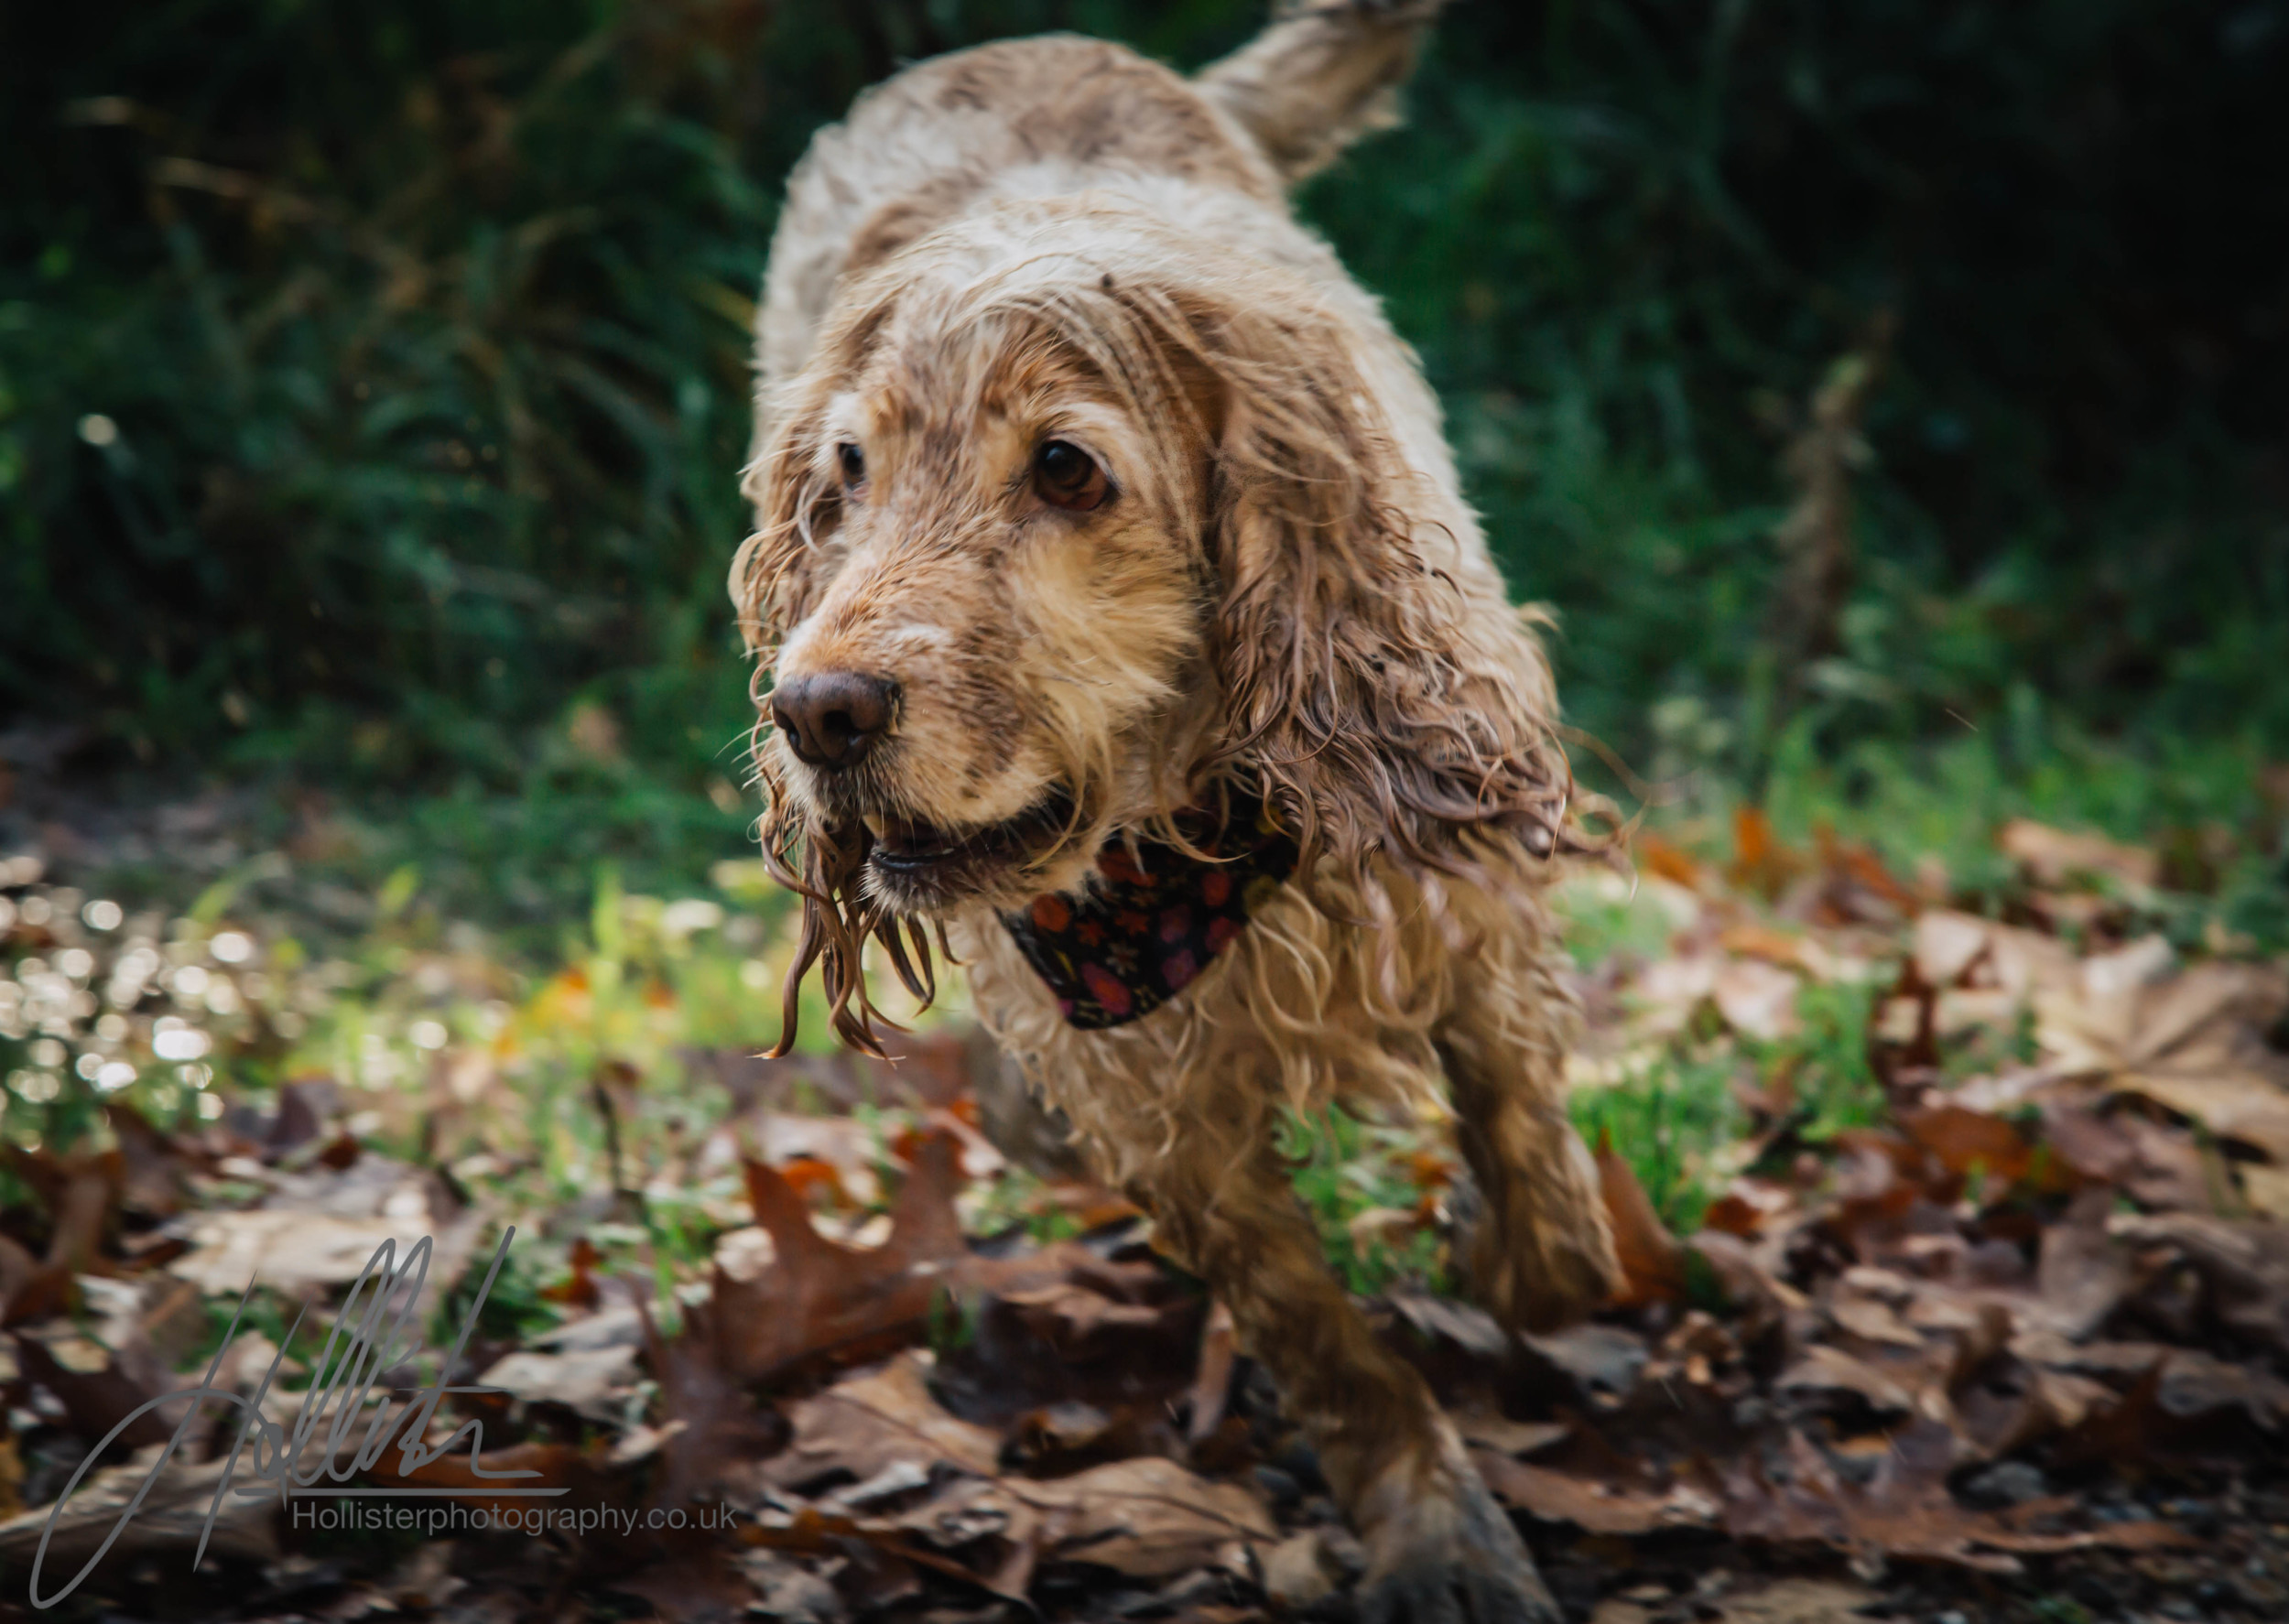 Hollisterphotography ABBY CLOWES WOOD DOG WALK-63.JPG